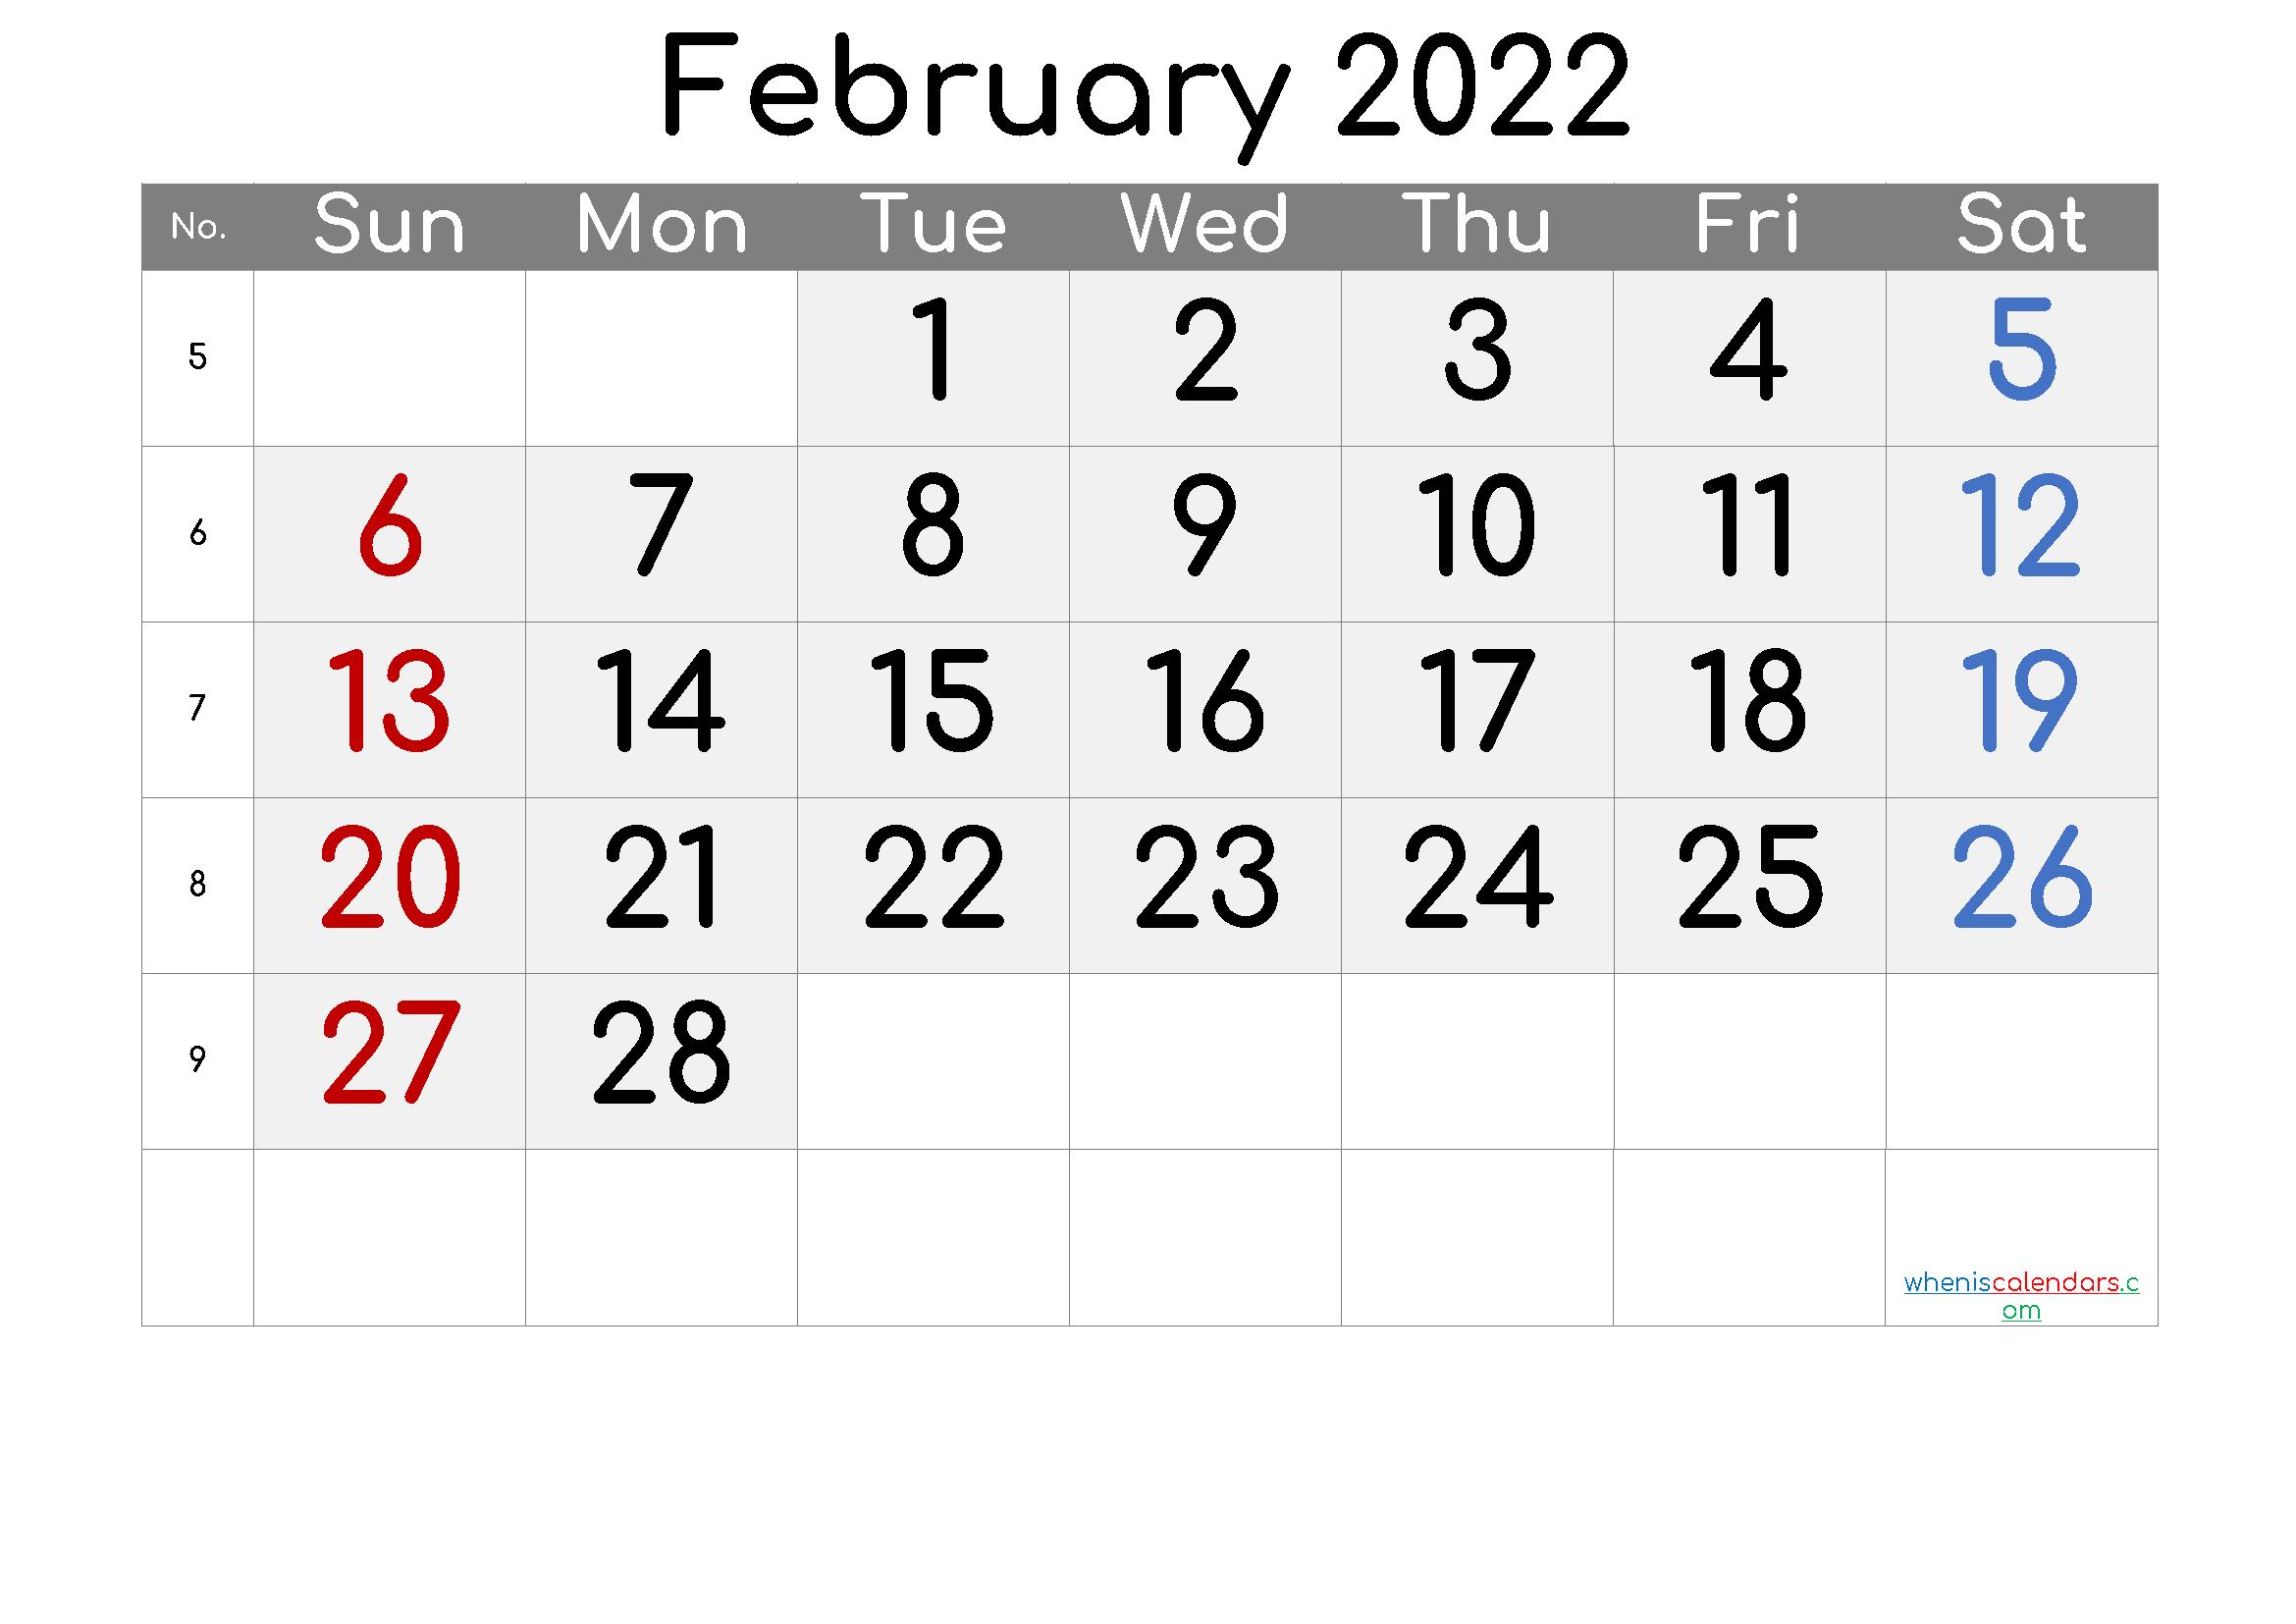 Free February 2022 Calendar with Week Numbers